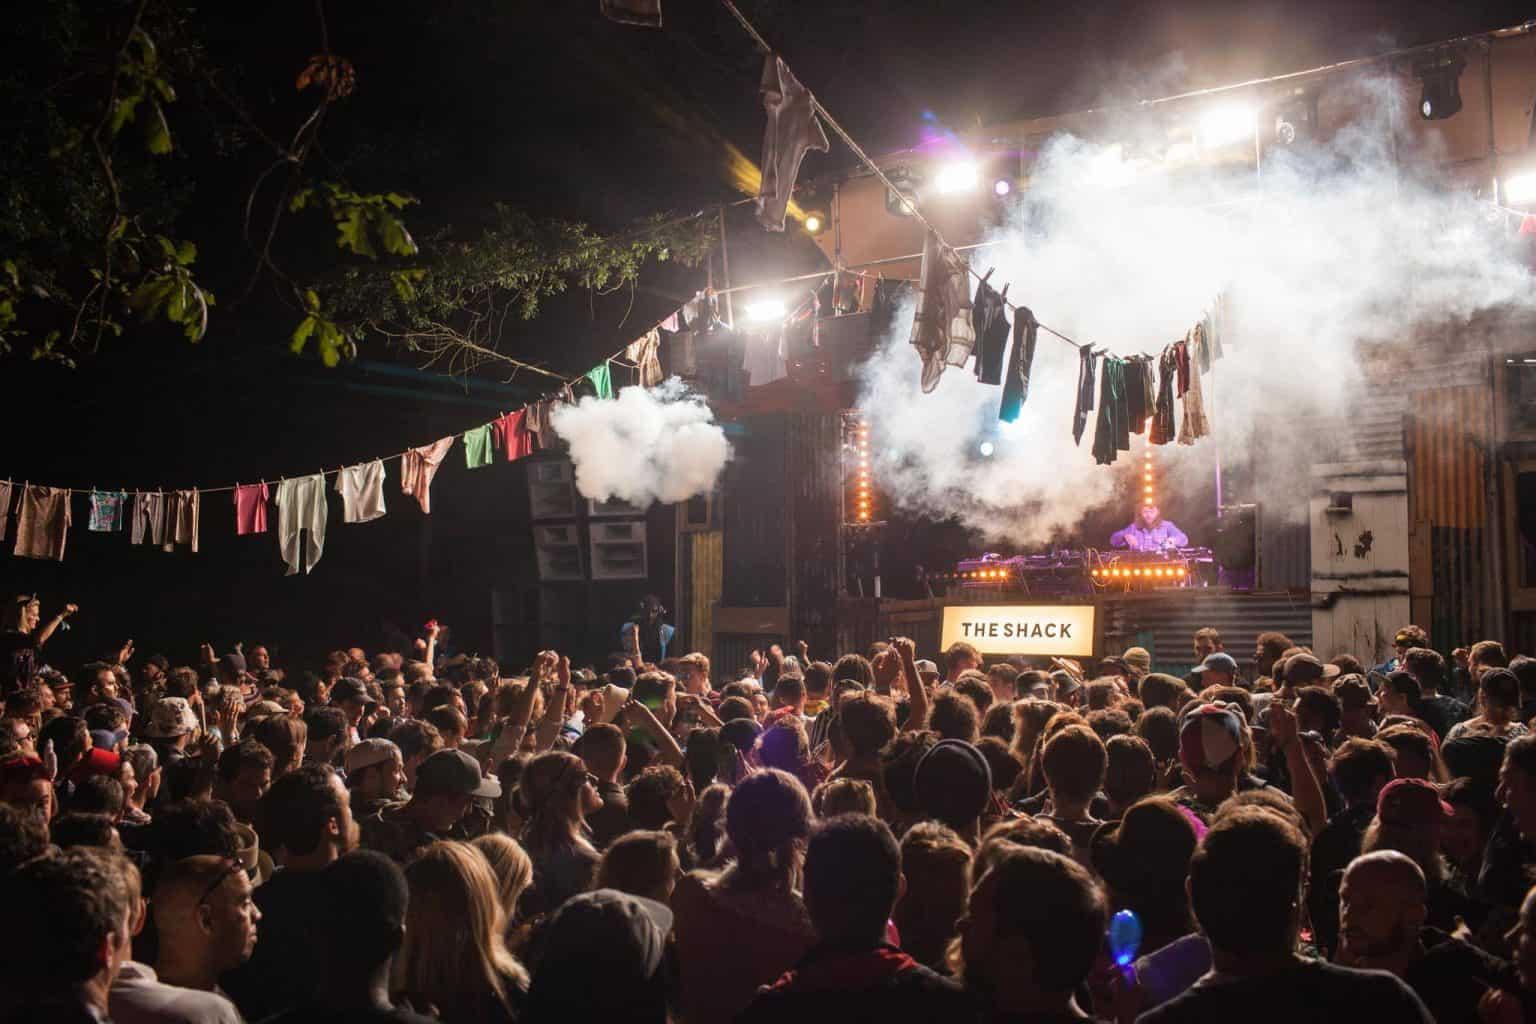 Farr Festival 2015 Shack Lighting Funktion one Vortex Events